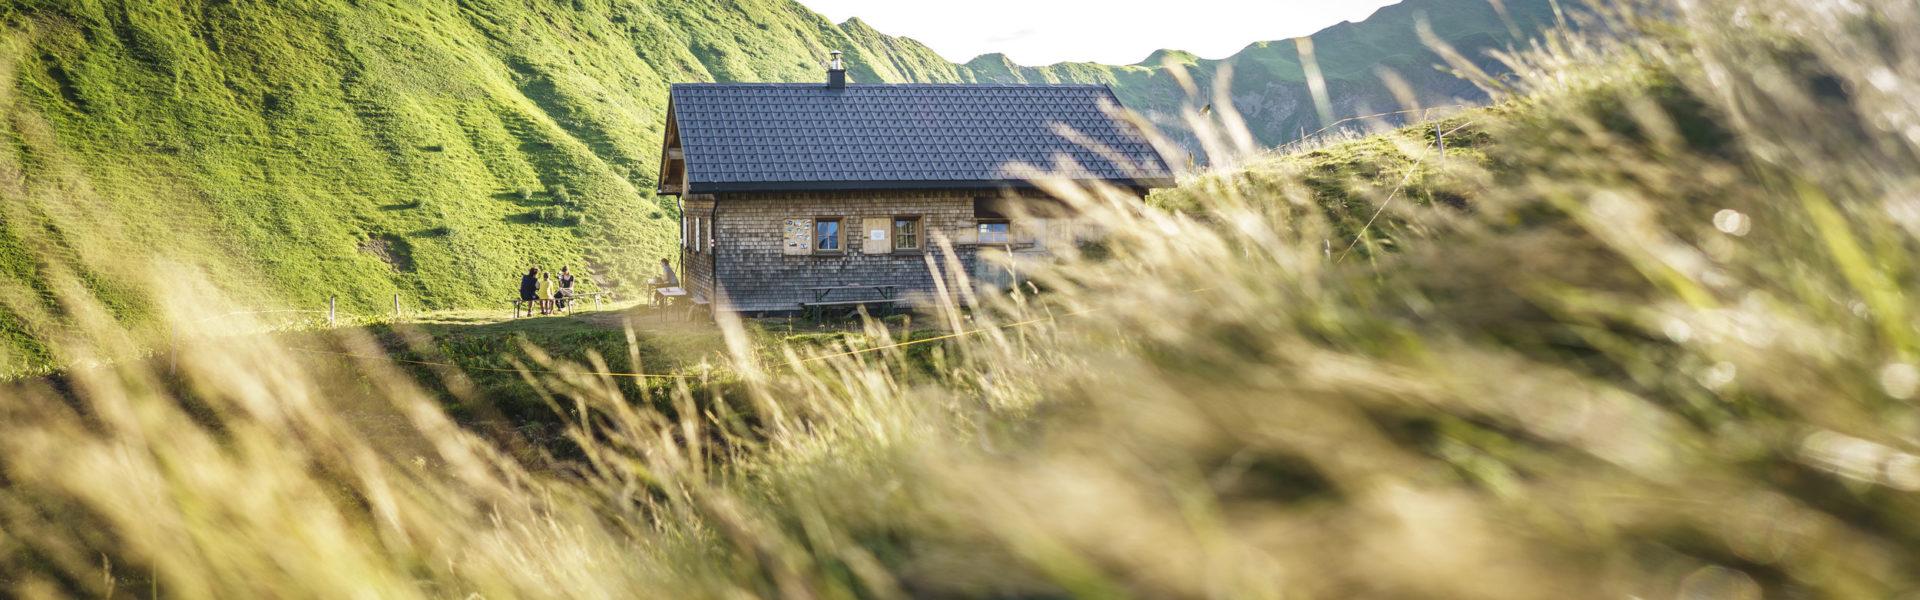 Bärguntalpe Kleinwalsertal © Dietmar Denger / Vorarlberg Tourismus